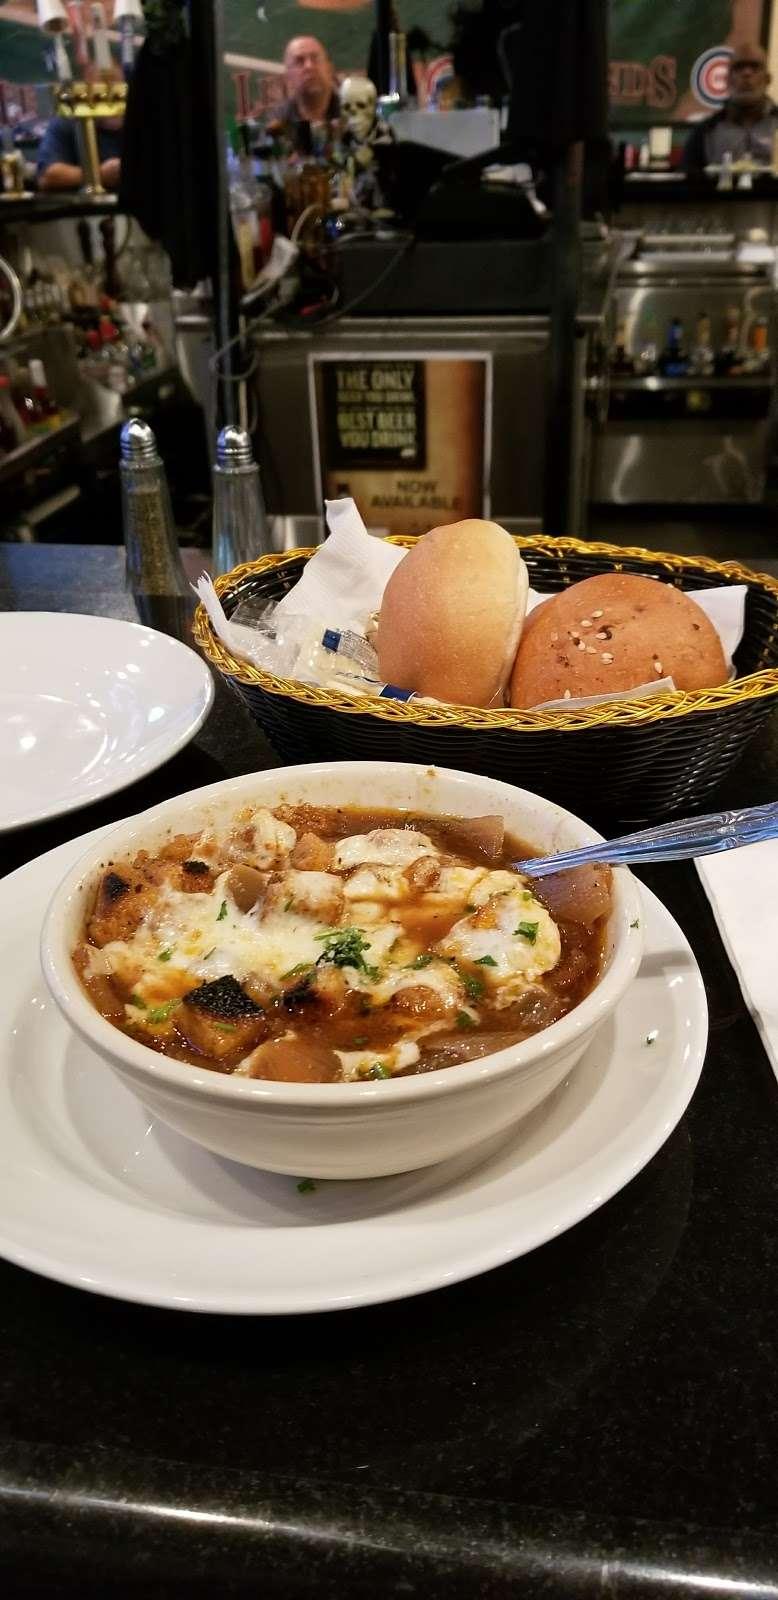 Legends Sports Bar & Grill - restaurant  | Photo 1 of 10 | Address: 4200 River Rd, Schiller Park, IL 60176, USA | Phone: (847) 233-9000